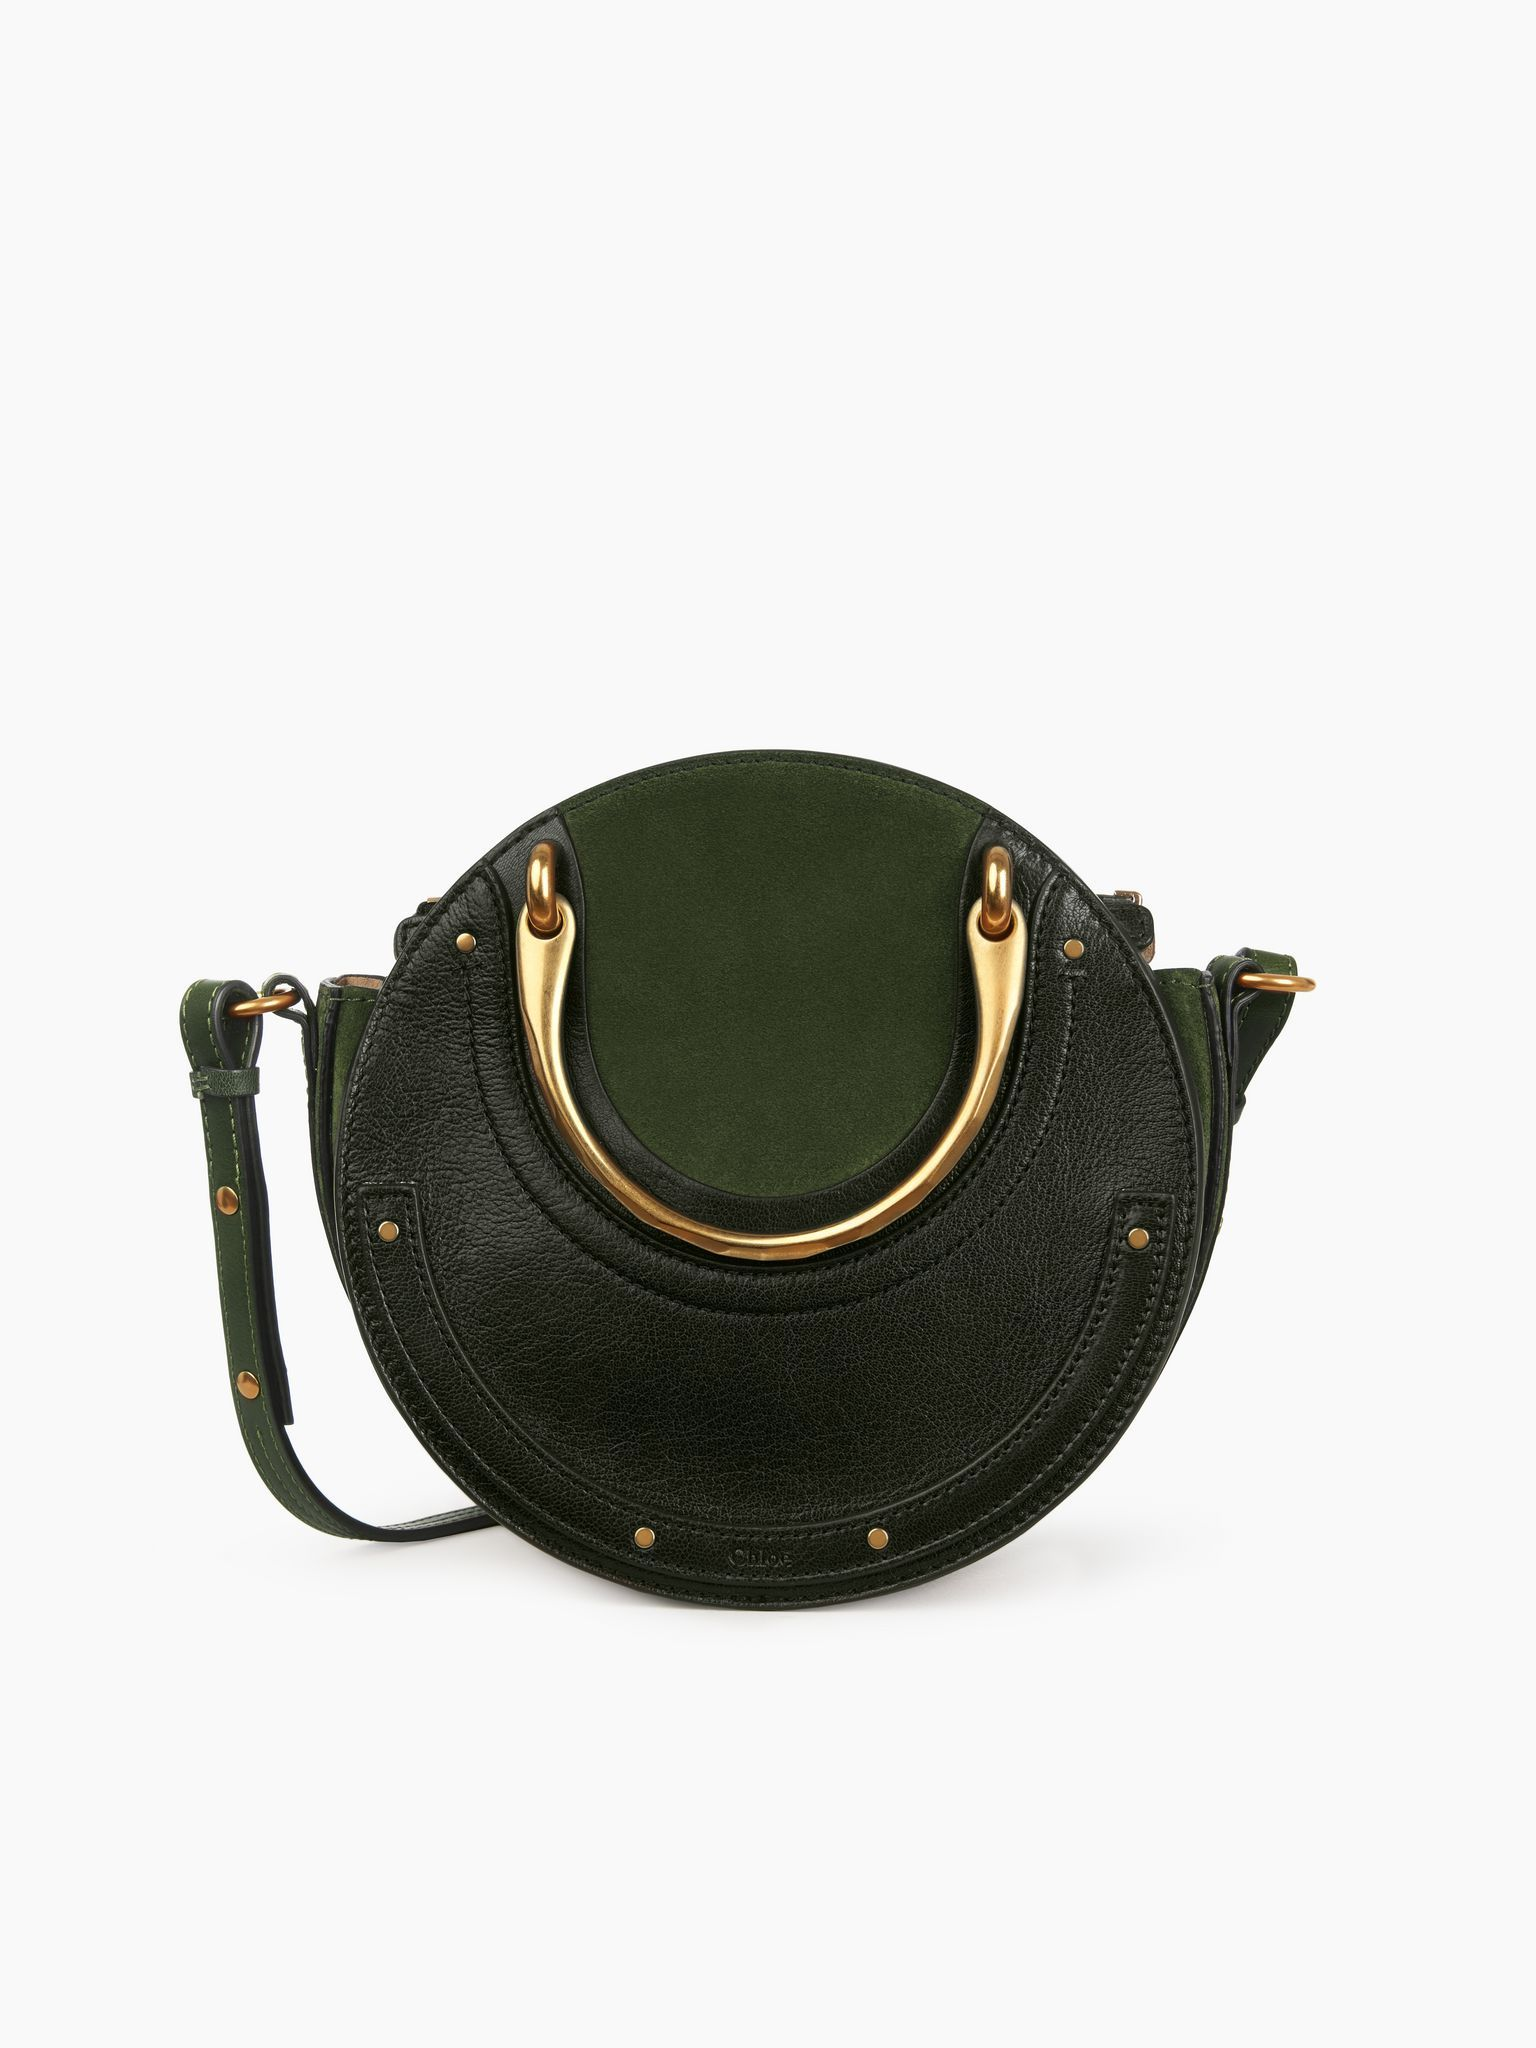 ac26a6645568e Chloe Small Pixie Bag, Women's Bags,Green | Chloe bags | Bags, Chloe ...